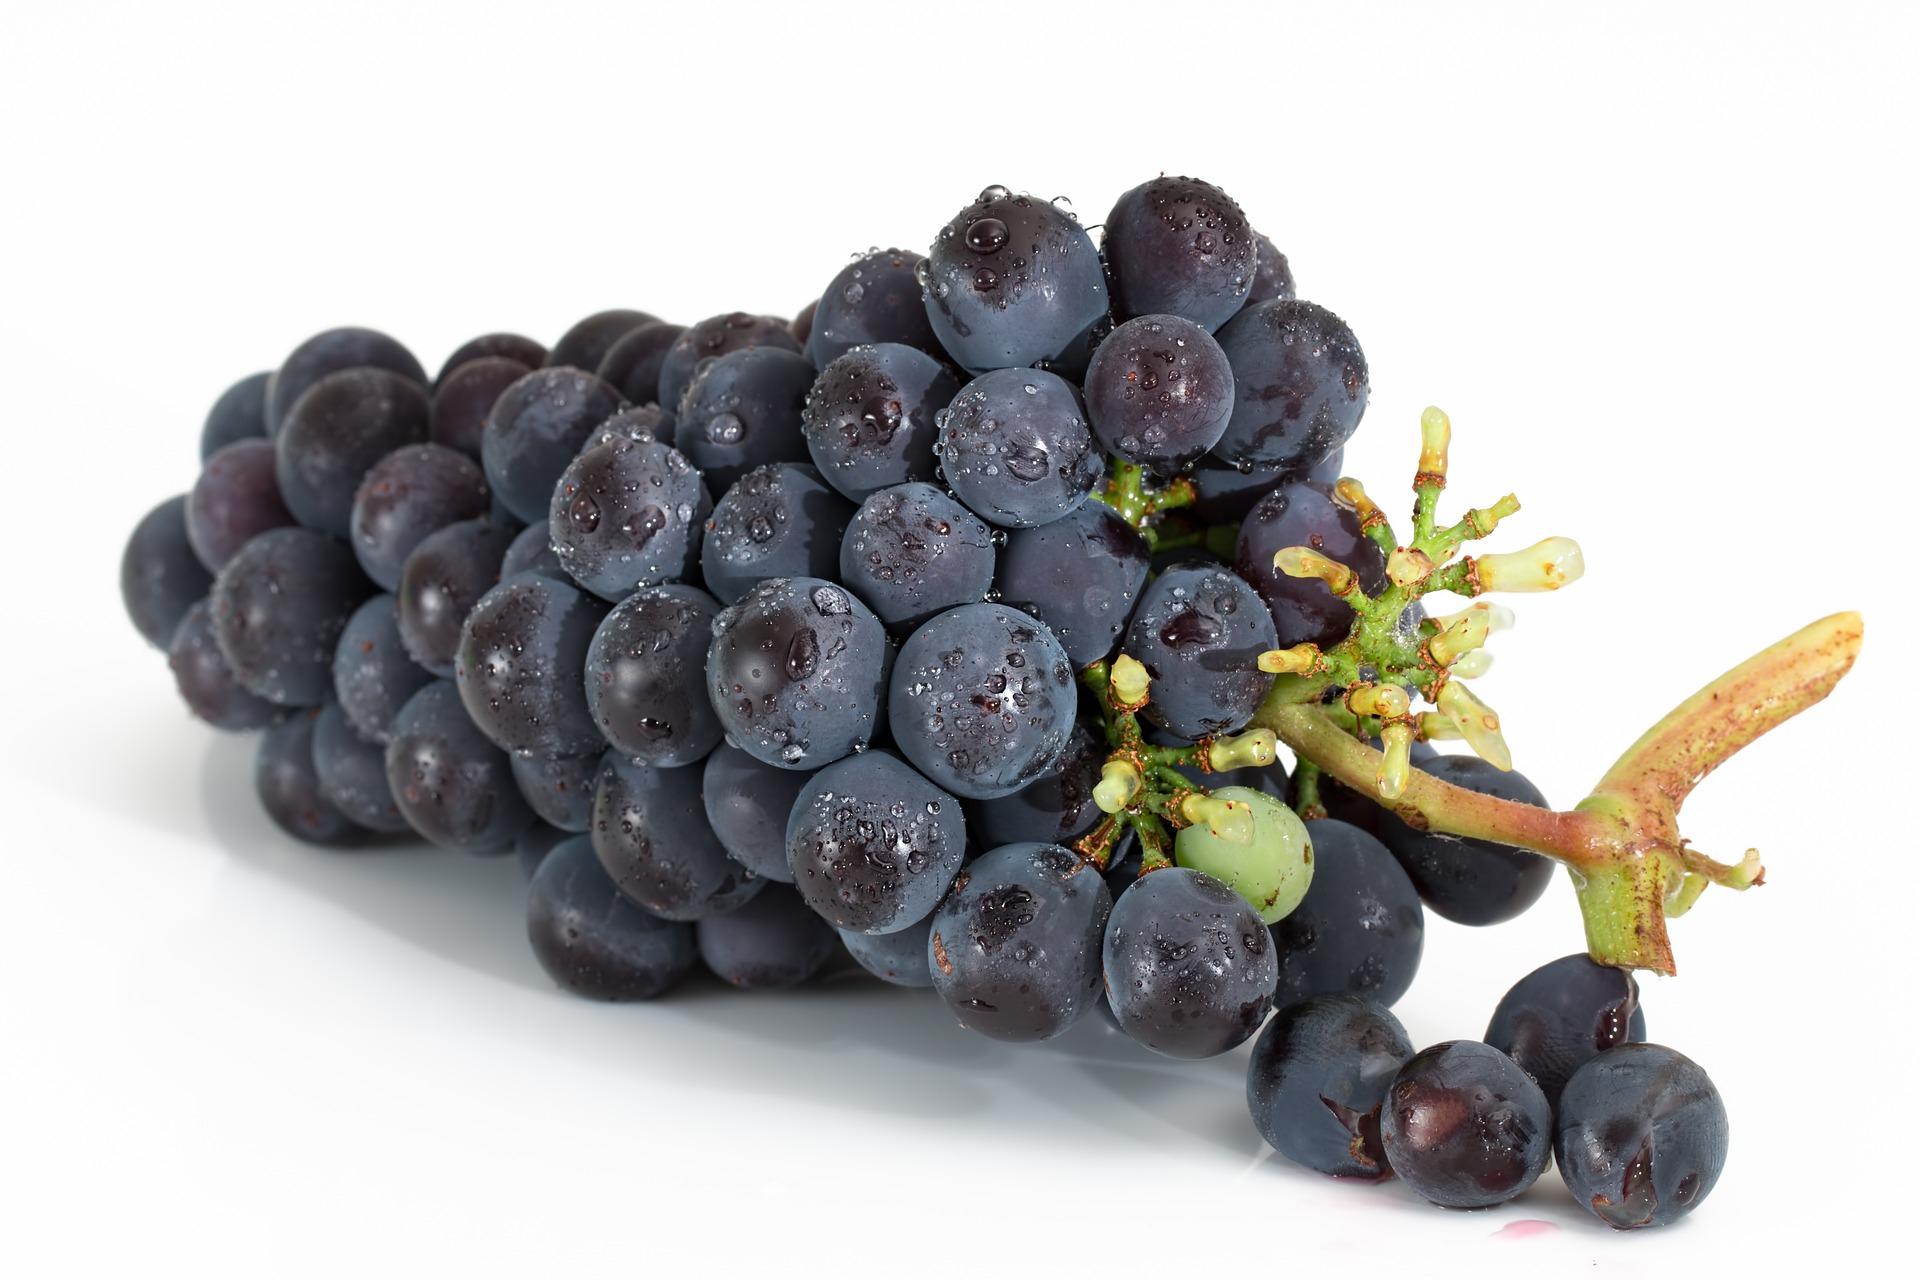 grapes-2032838 1920 jpg